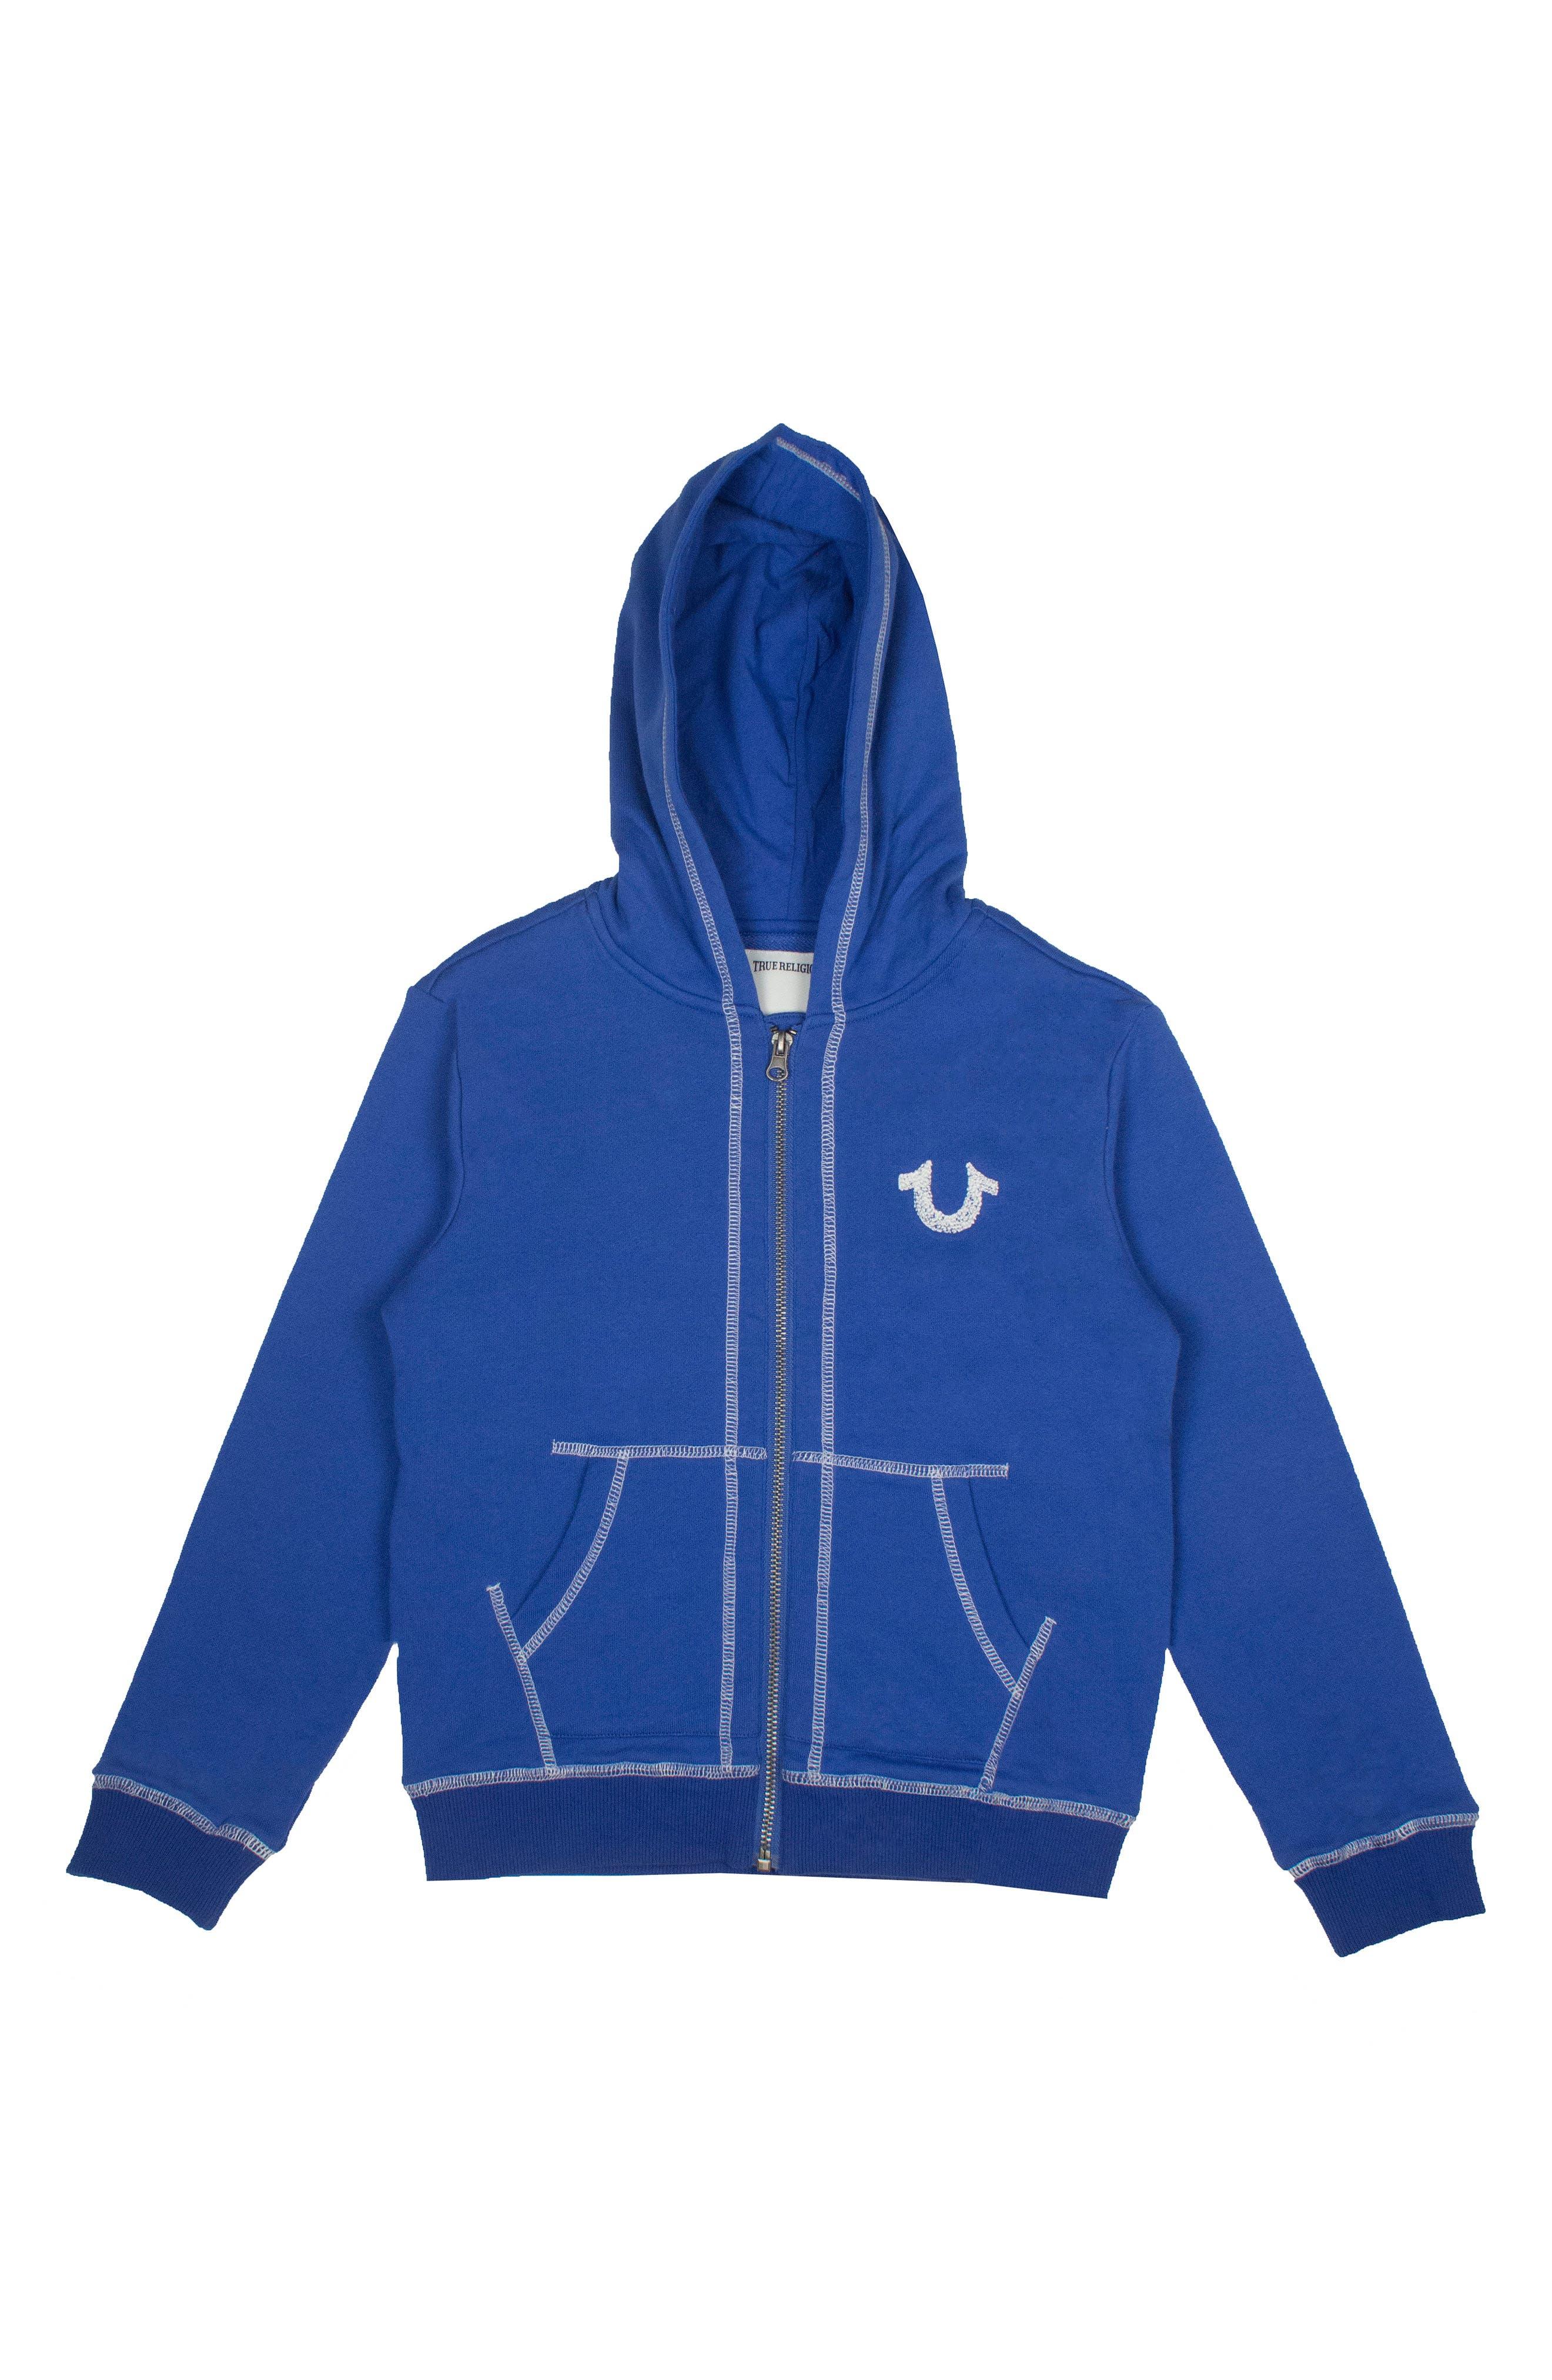 True Religion Brand Jeans Shoe String Zip Hoodie (Toddler Boys & Little Boys)